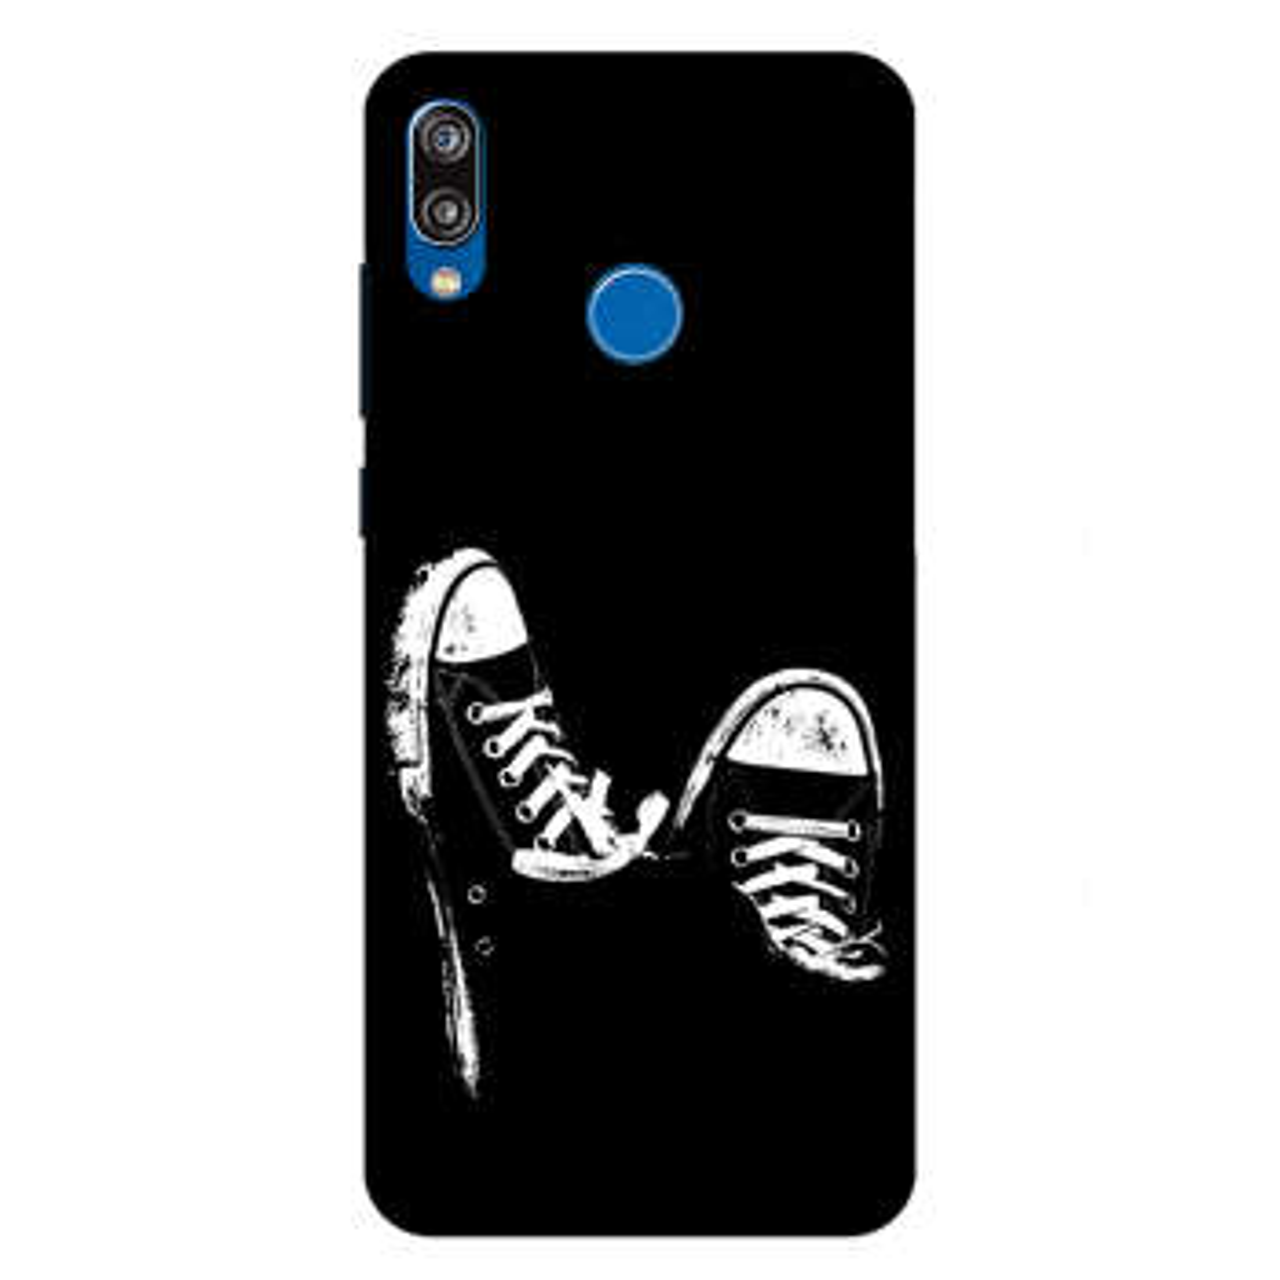 کاور کی اچ کد 0043 مناسب برای گوشی موبایل هوآوی Y7 Prime 2019